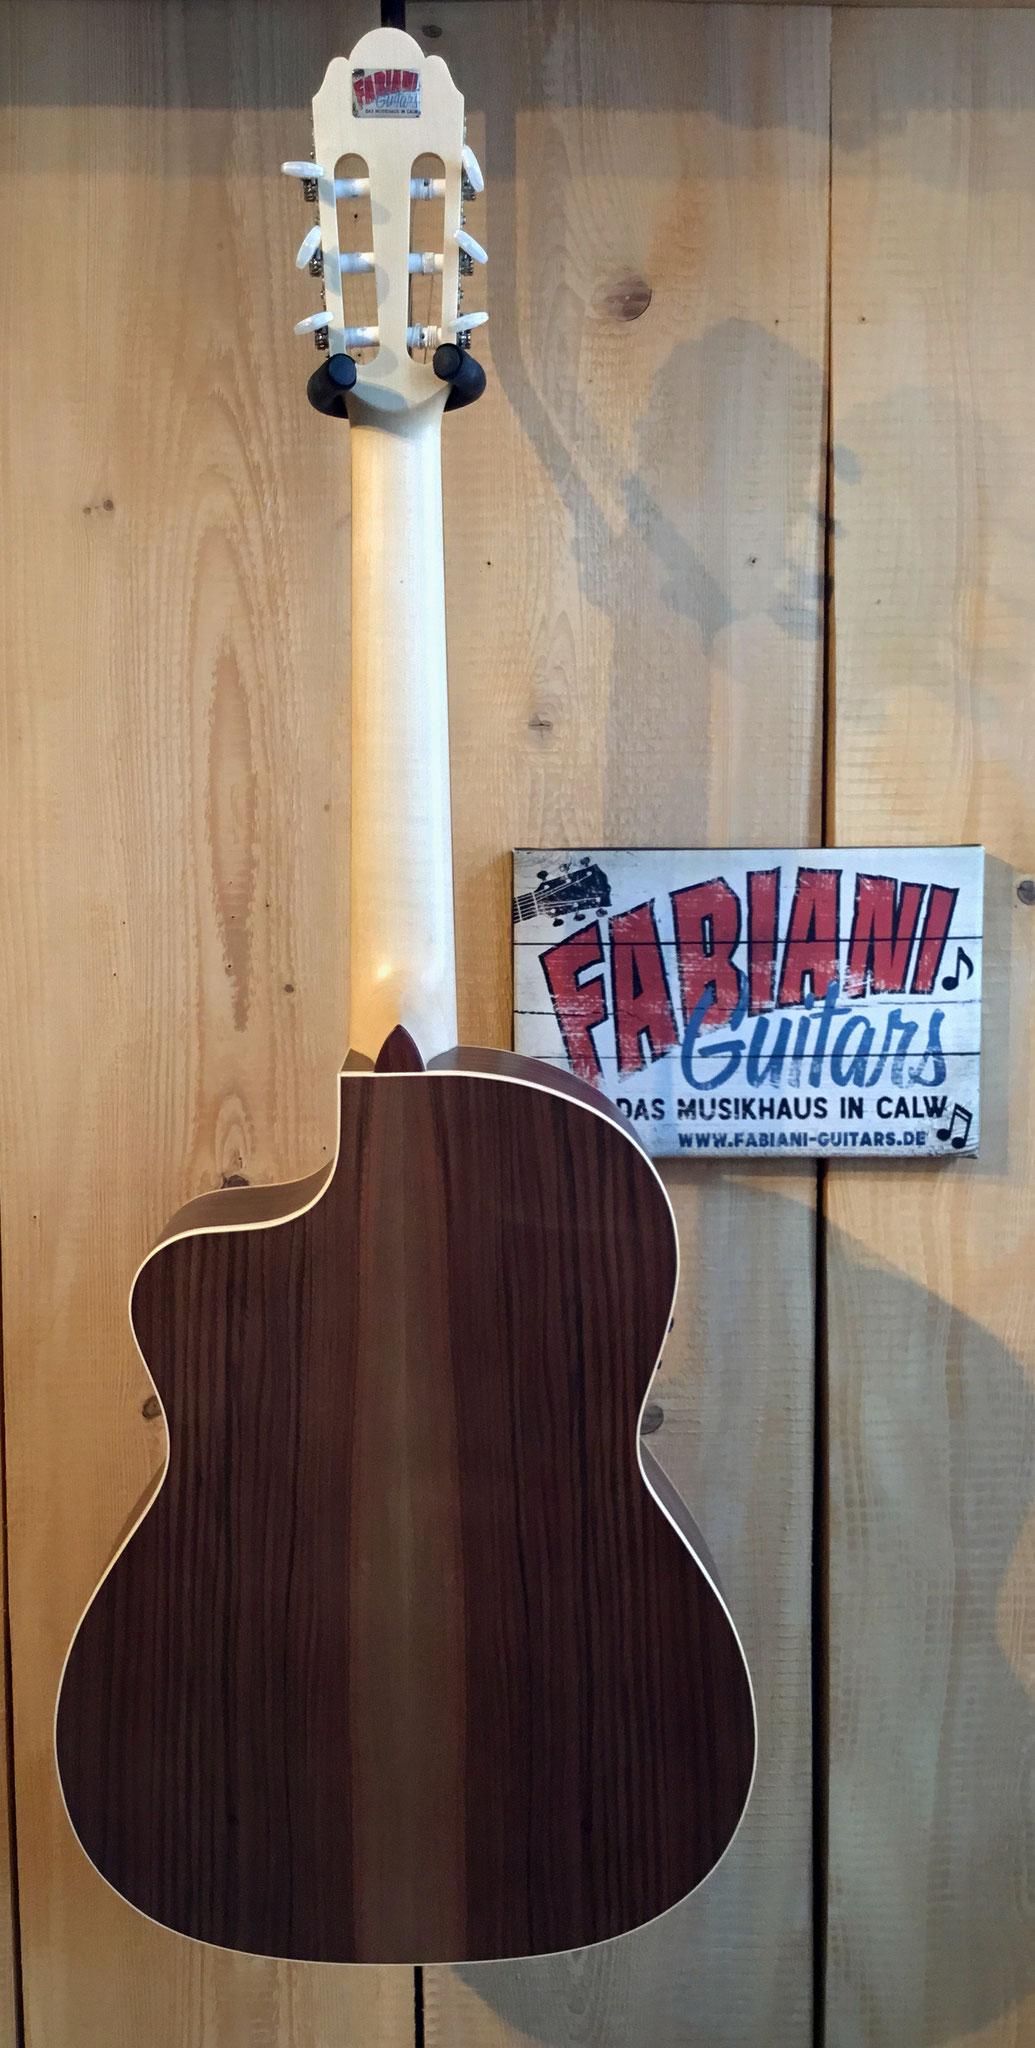 Pro Natura Silver Series Samba Walnuss/Walnut, E-Konzertgitarre,  Electric- Classicguitar. Tonabnehmer, Tuner, Musik Fabiani Guitars 75365 Calw